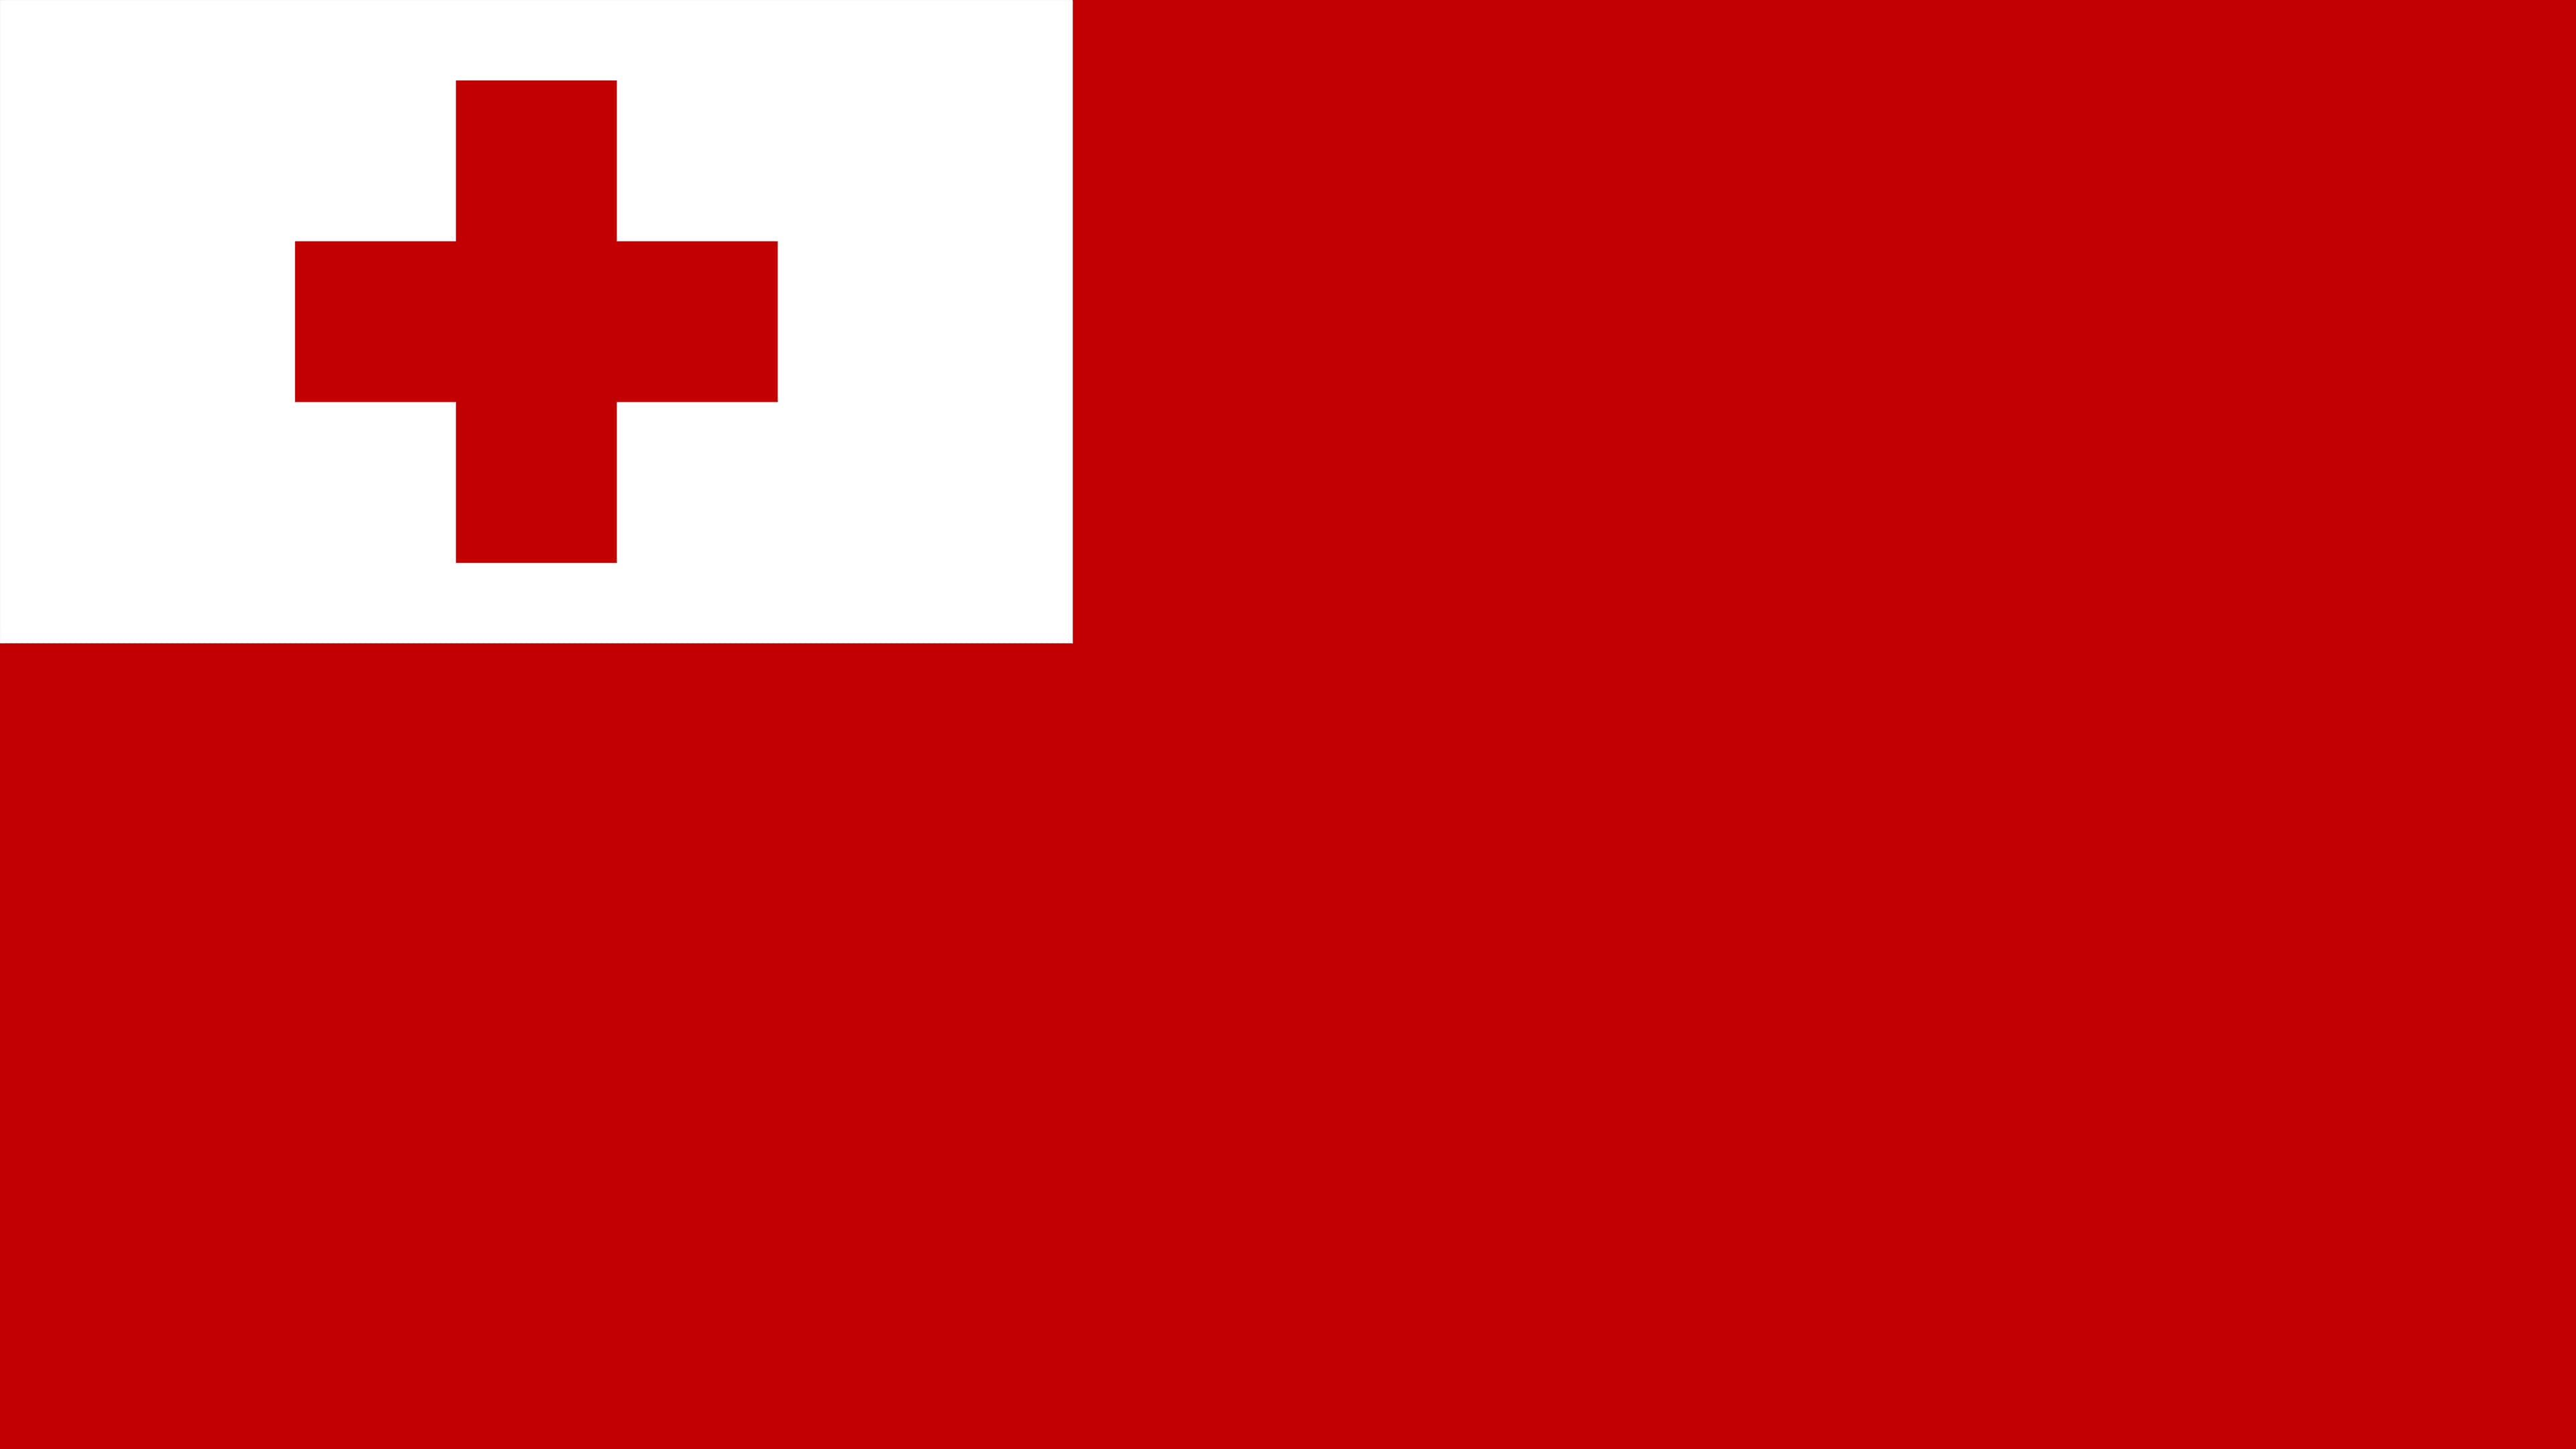 tonga flag uhd 4k wallpaper